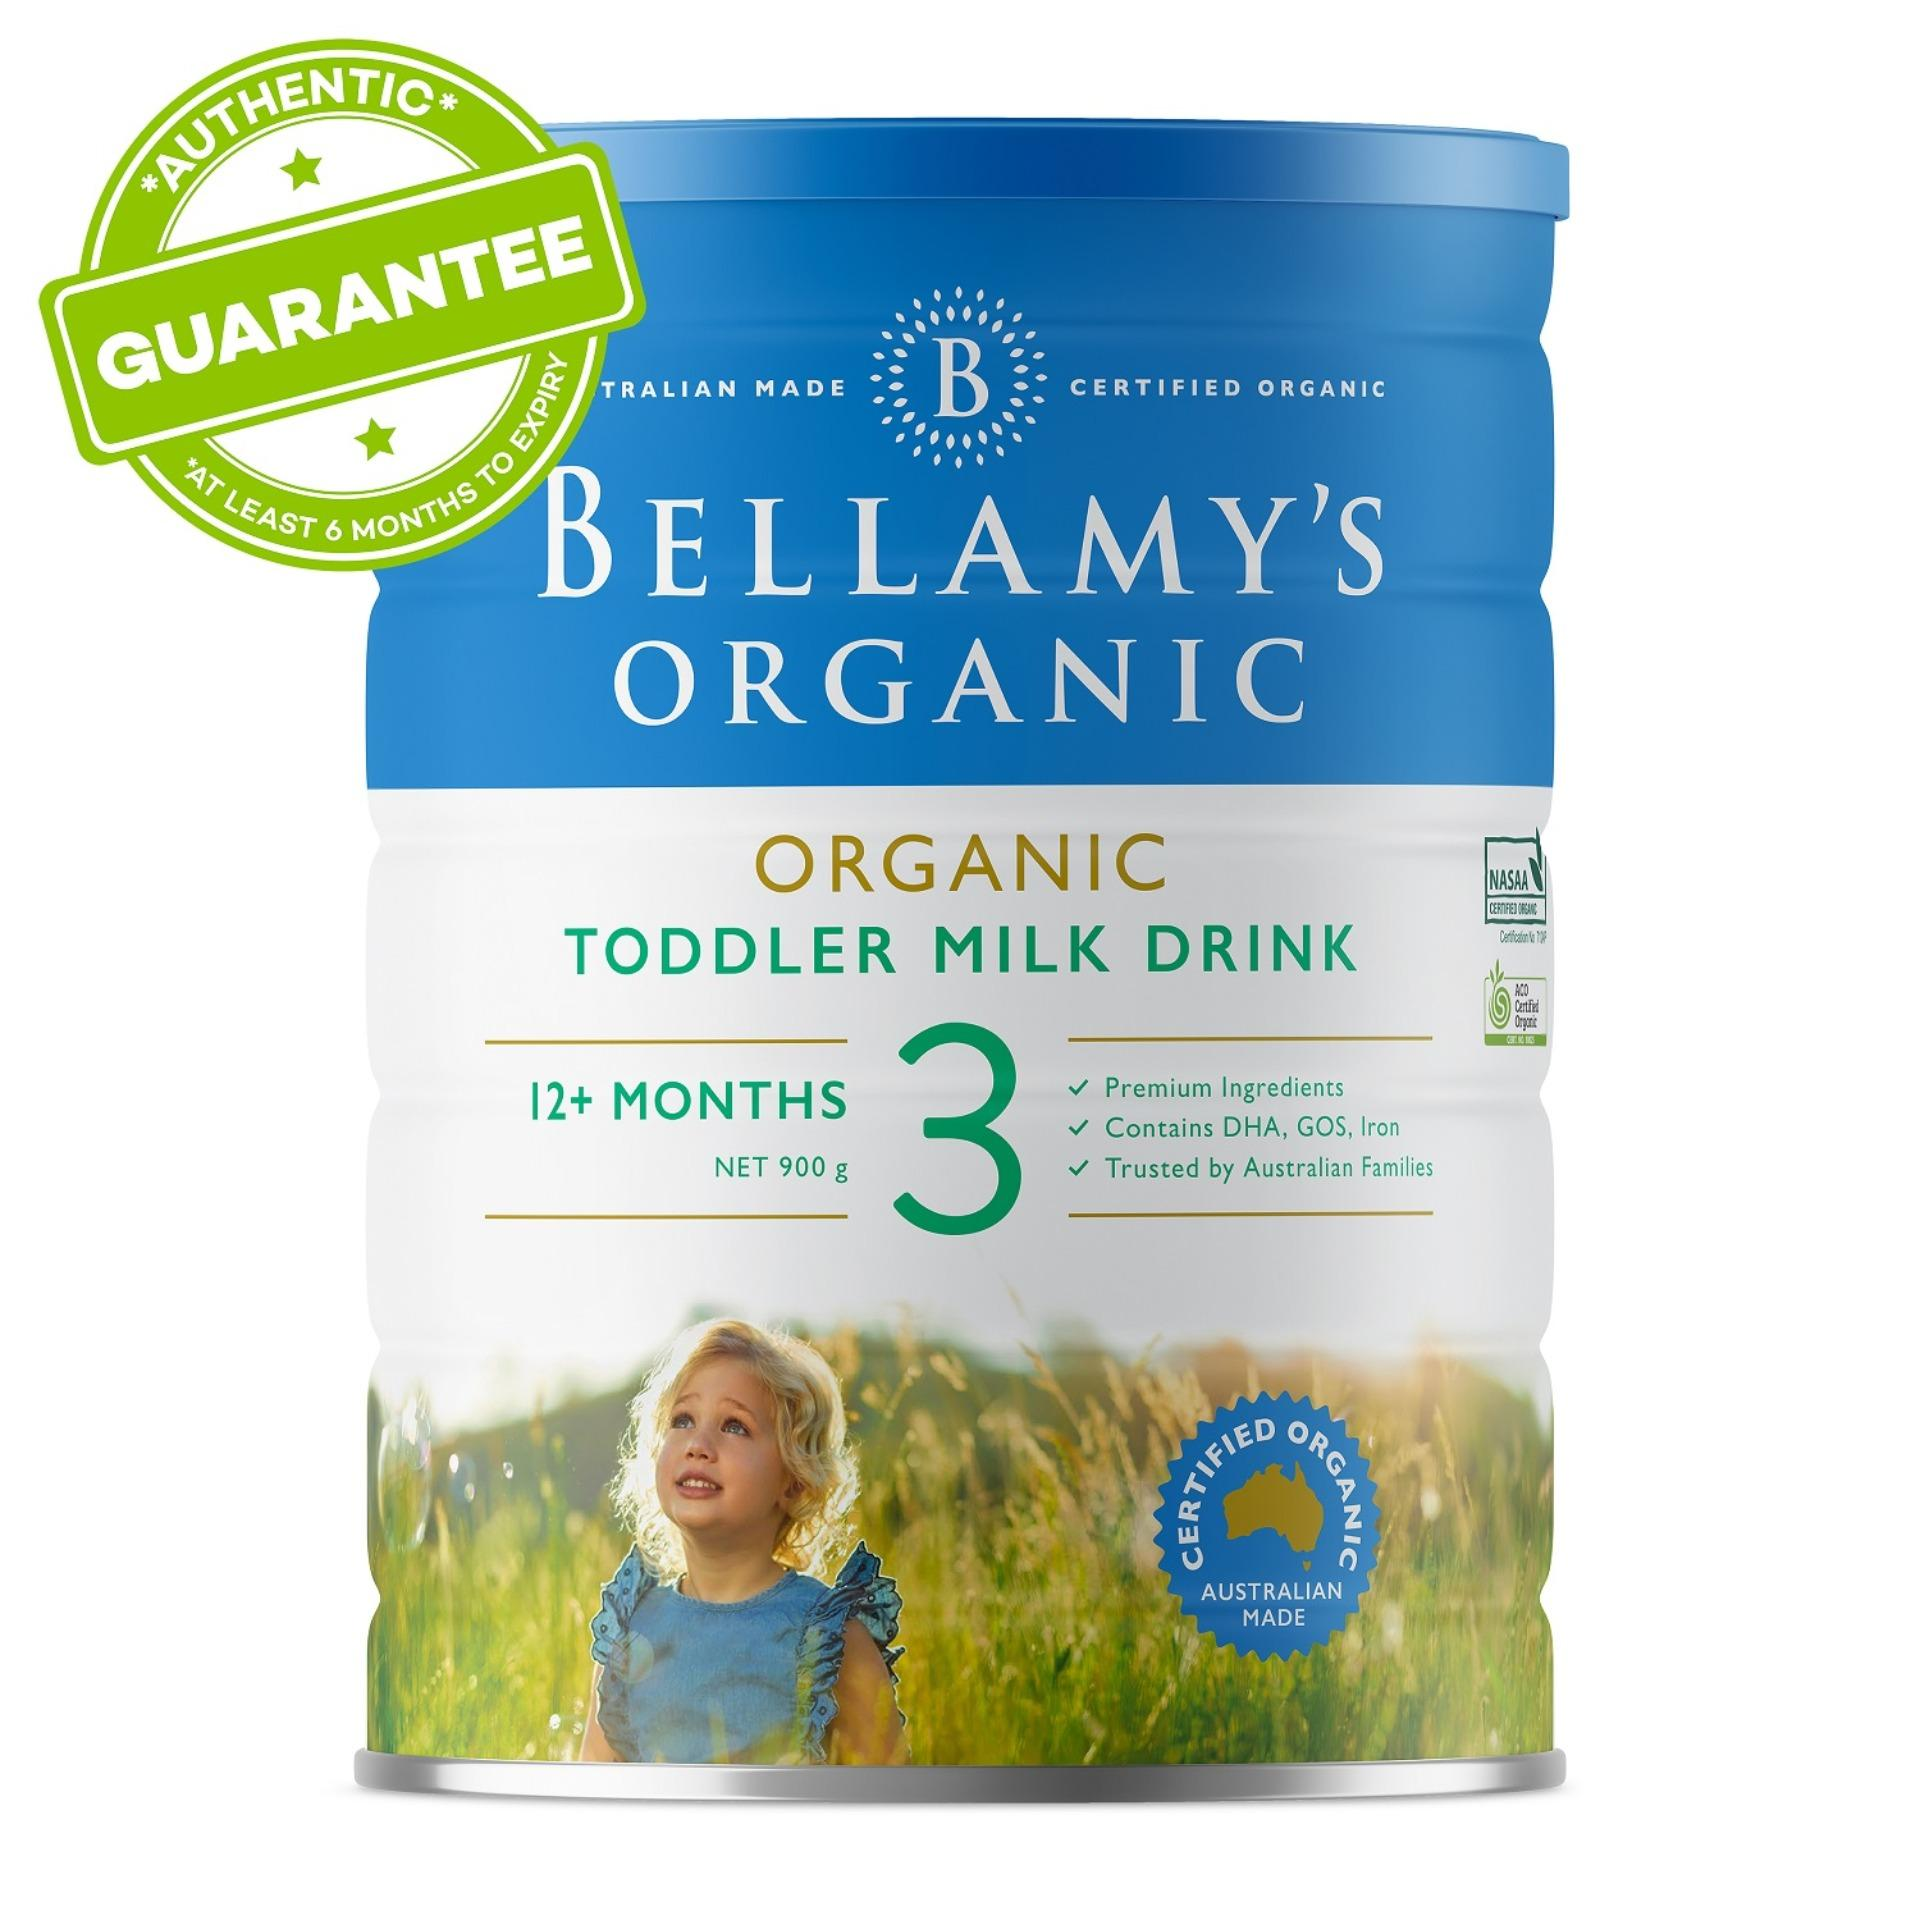 Bellamys Organic Step 3 Toddler Milk Drink 900g (12months+) By Lazada Retail Bellamys Organic